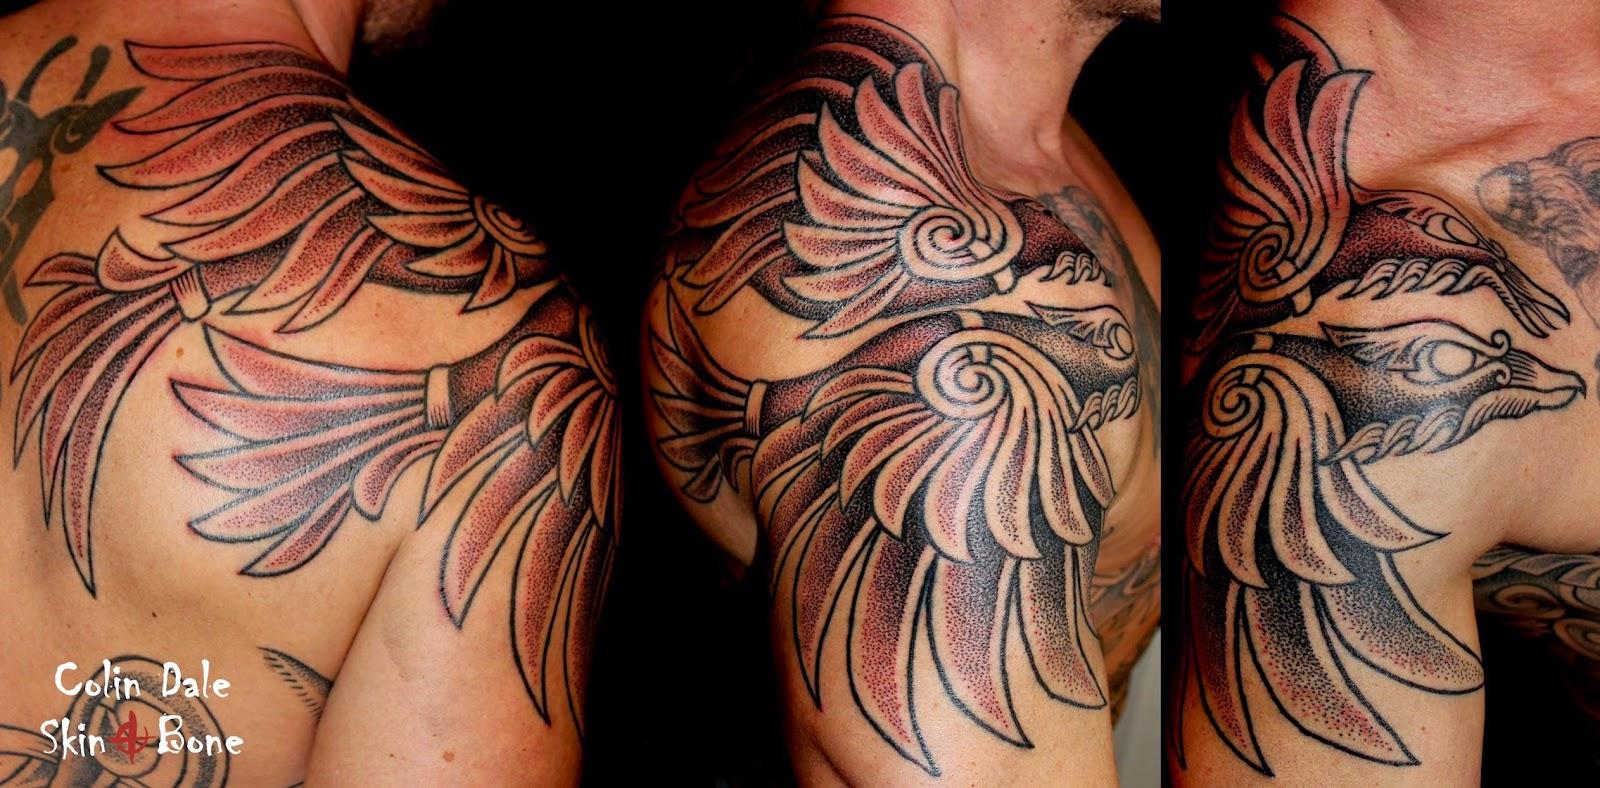 Odin S Ravens Tattoos: SKiN&BoNE: Artistic Process: Ragnarok And Other Stories